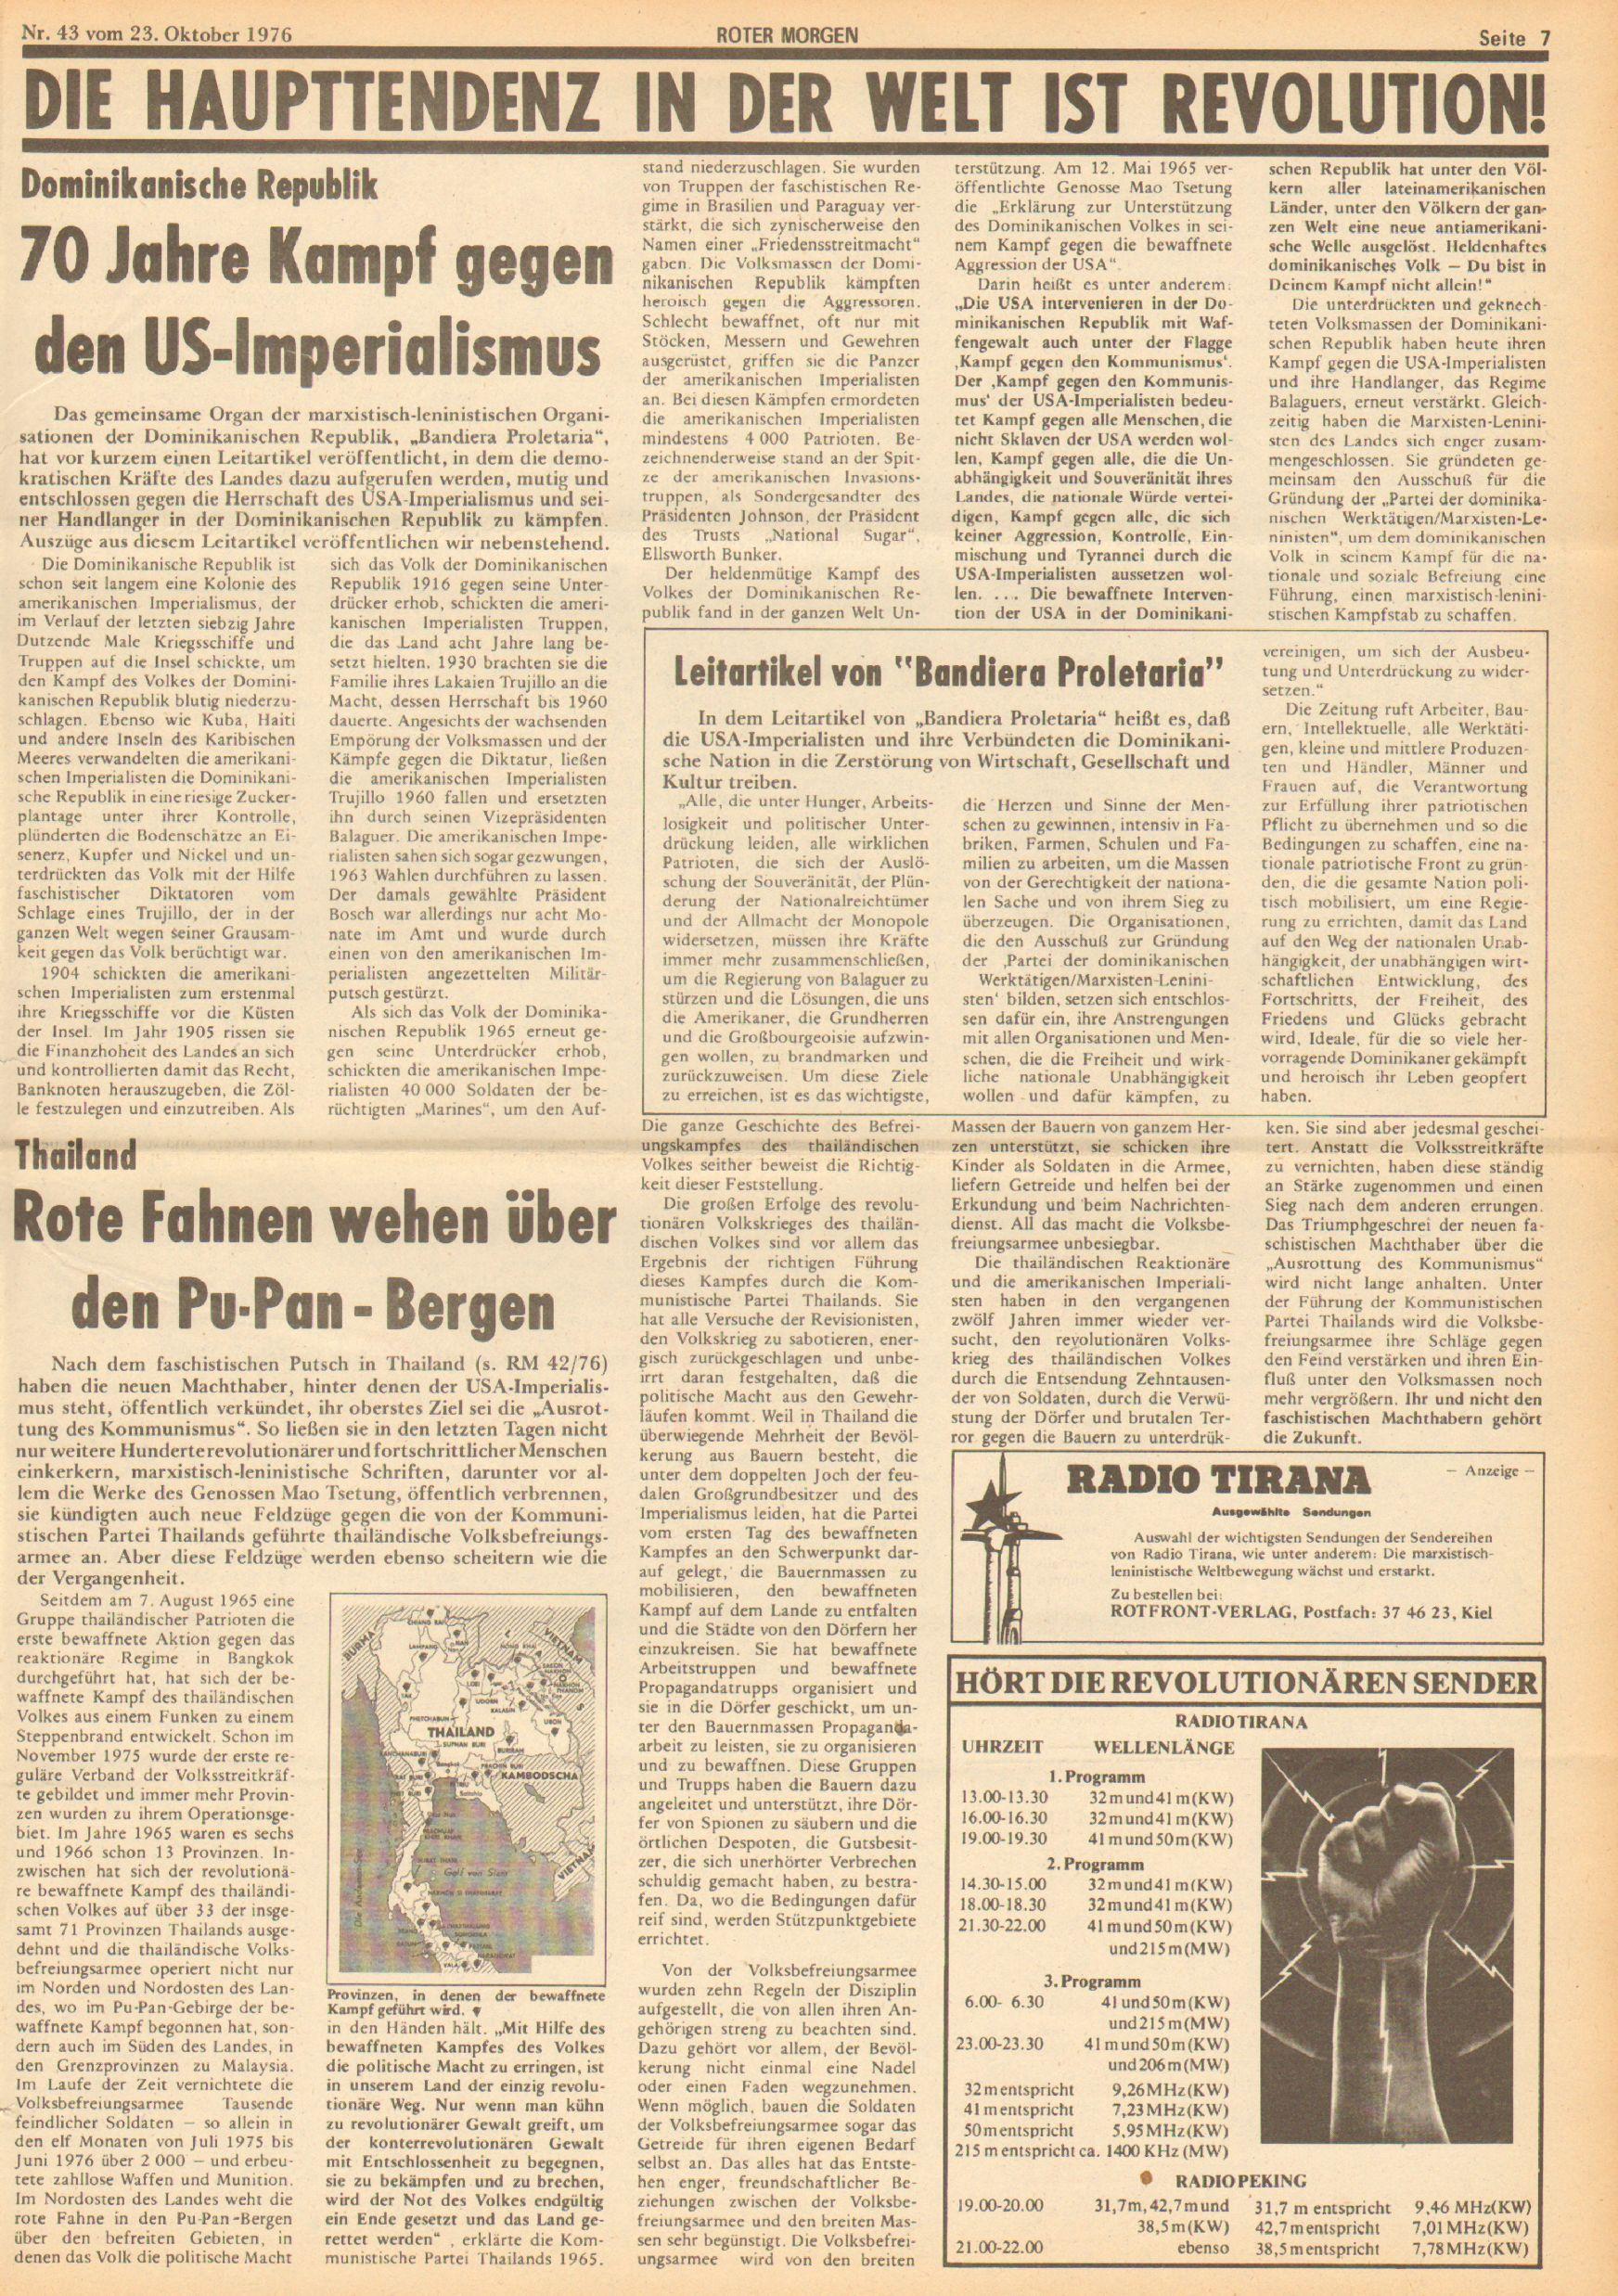 Roter Morgen, 10. Jg., 23. Oktober 1976, Nr. 43, Seite 7